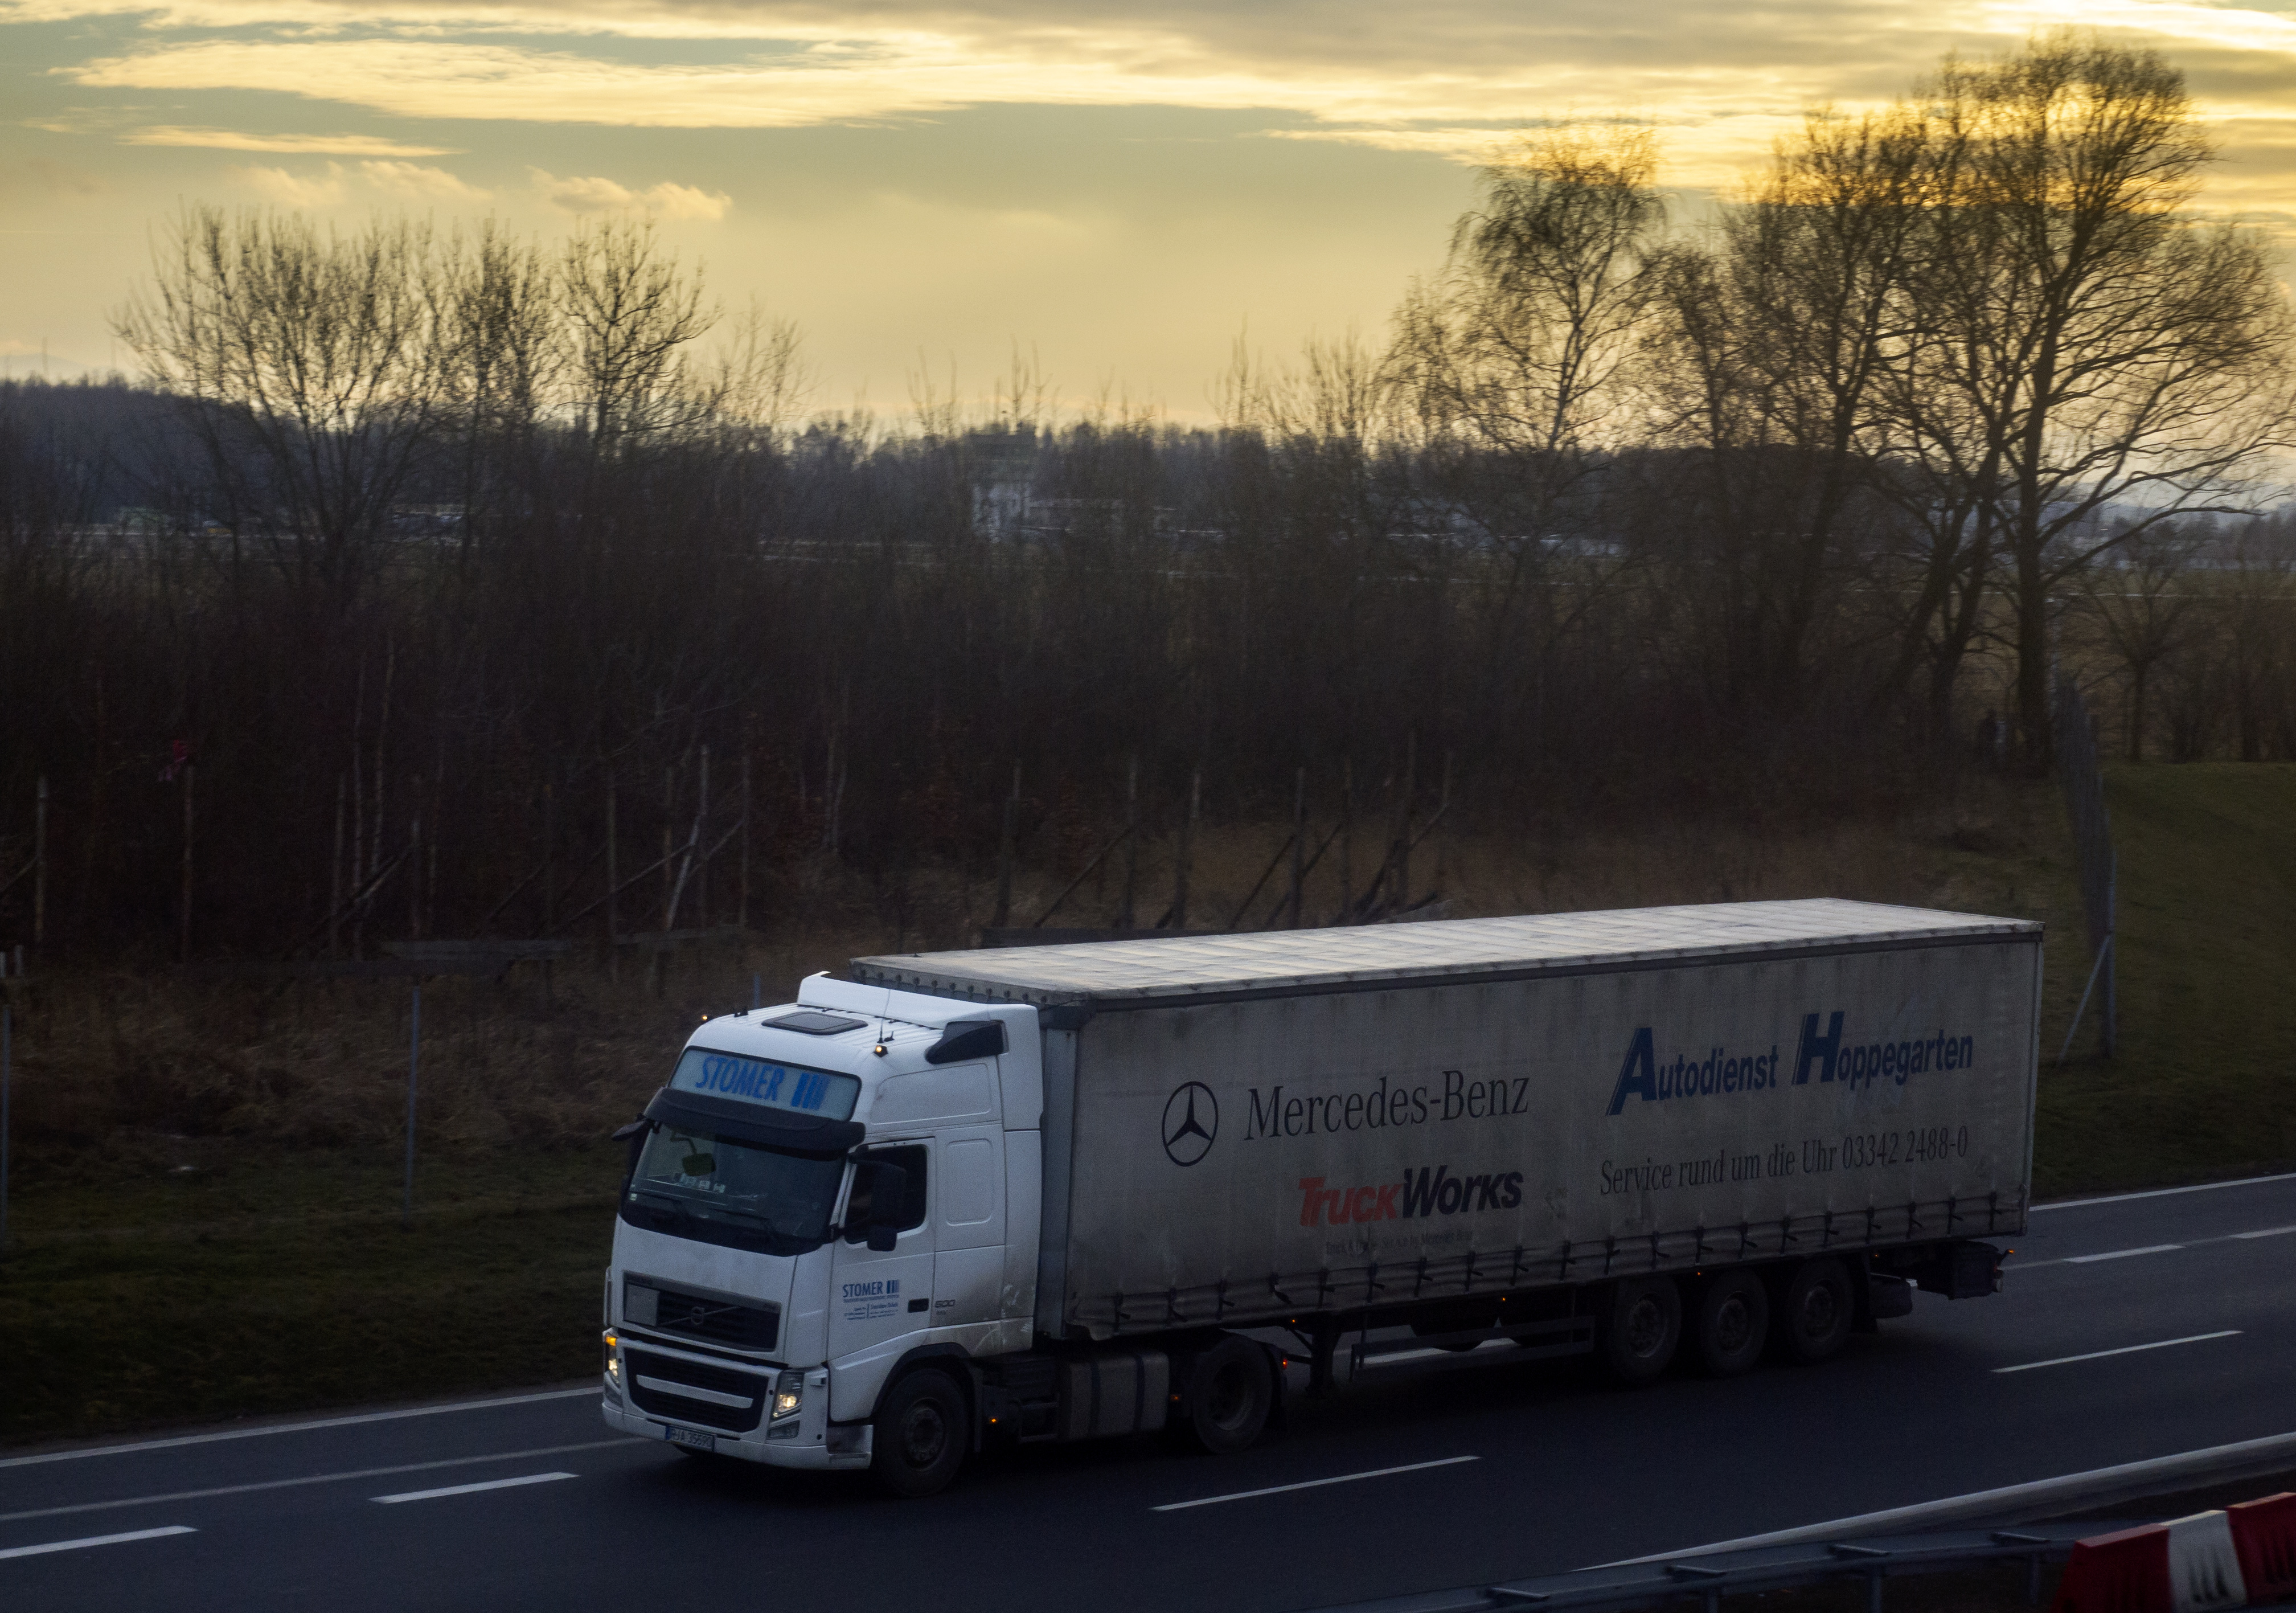 Volvo truck, Car, Forwarding, Freight, Goods, HQ Photo